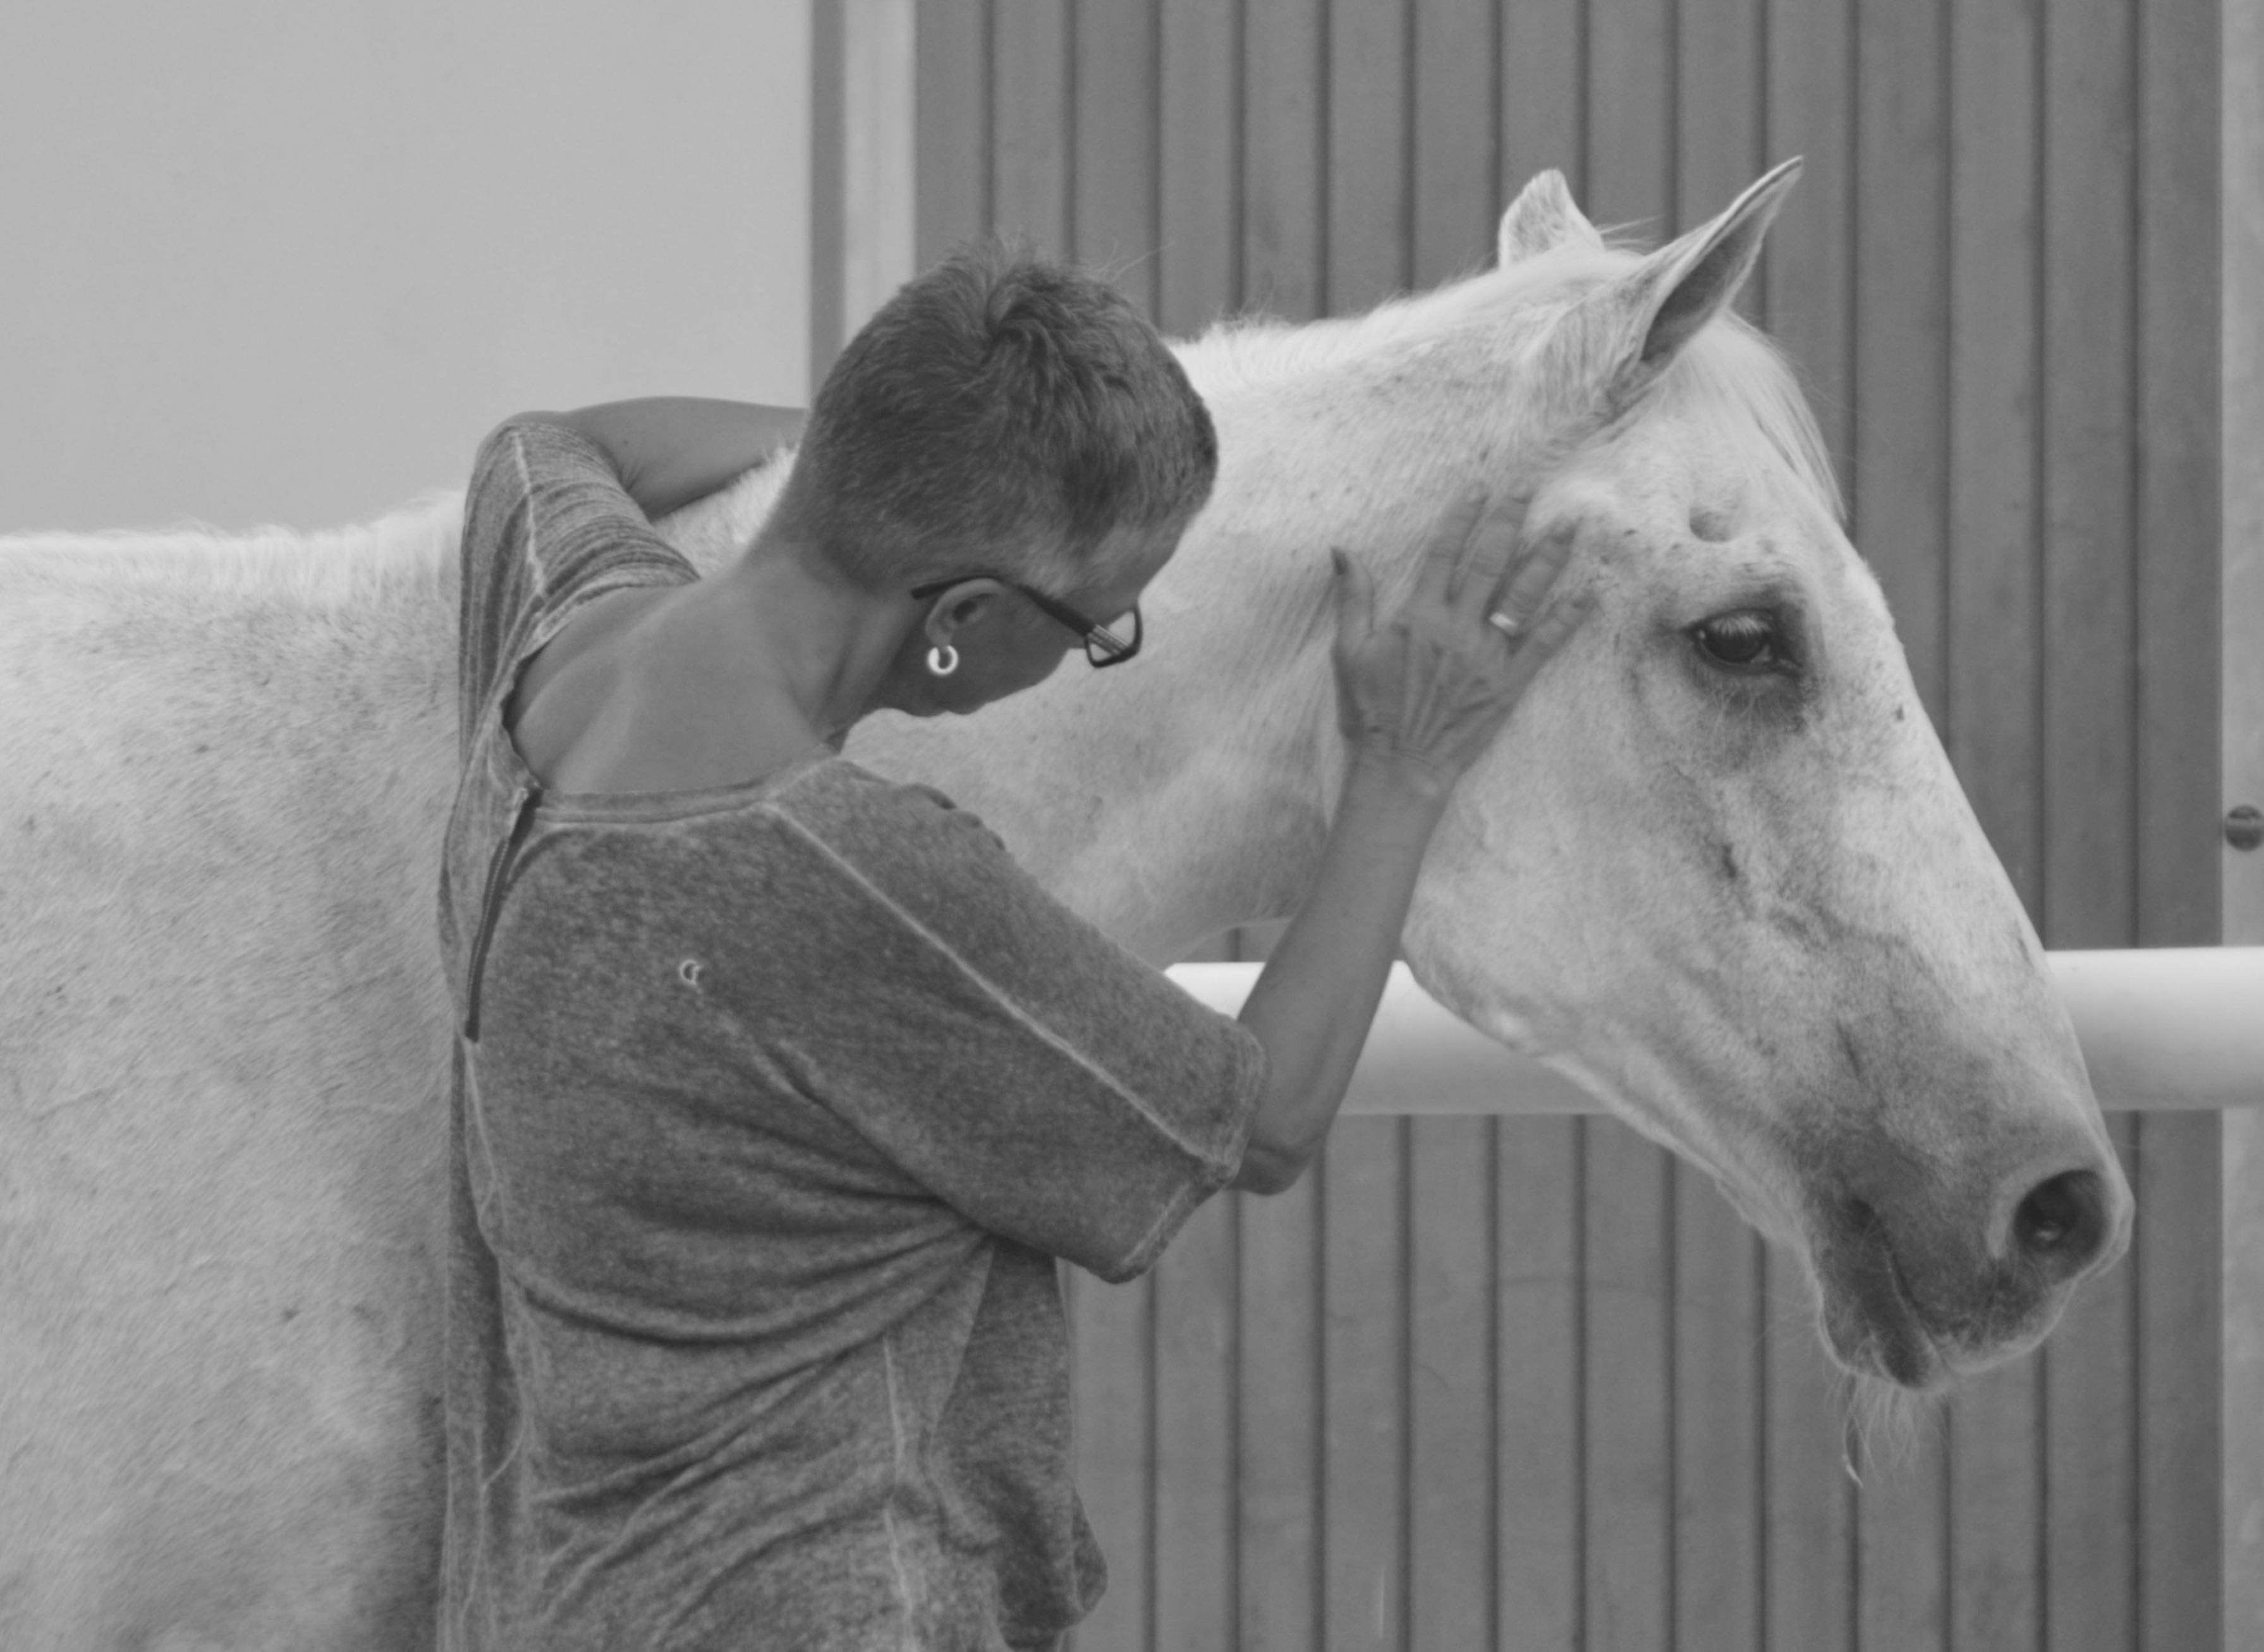 Horse and human in harmony - Abu Dhabi, United Arab Emirates